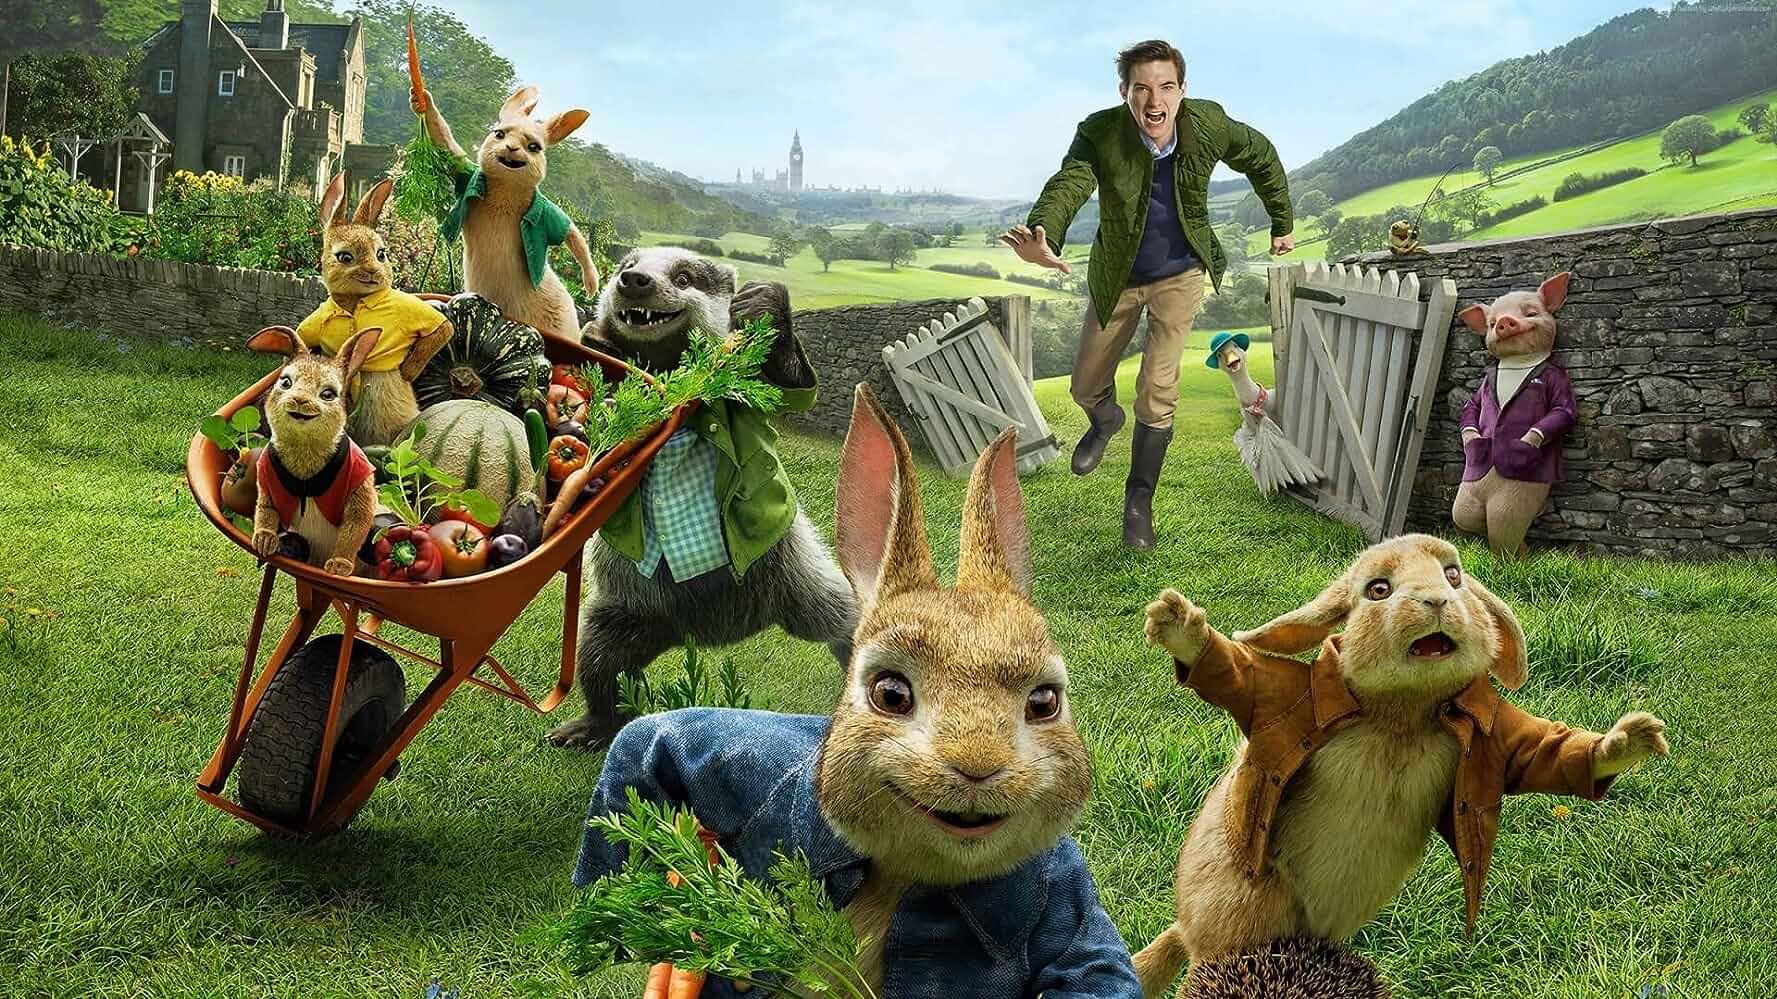 Domhnall Gleeson in Peter Rabbit (2018)